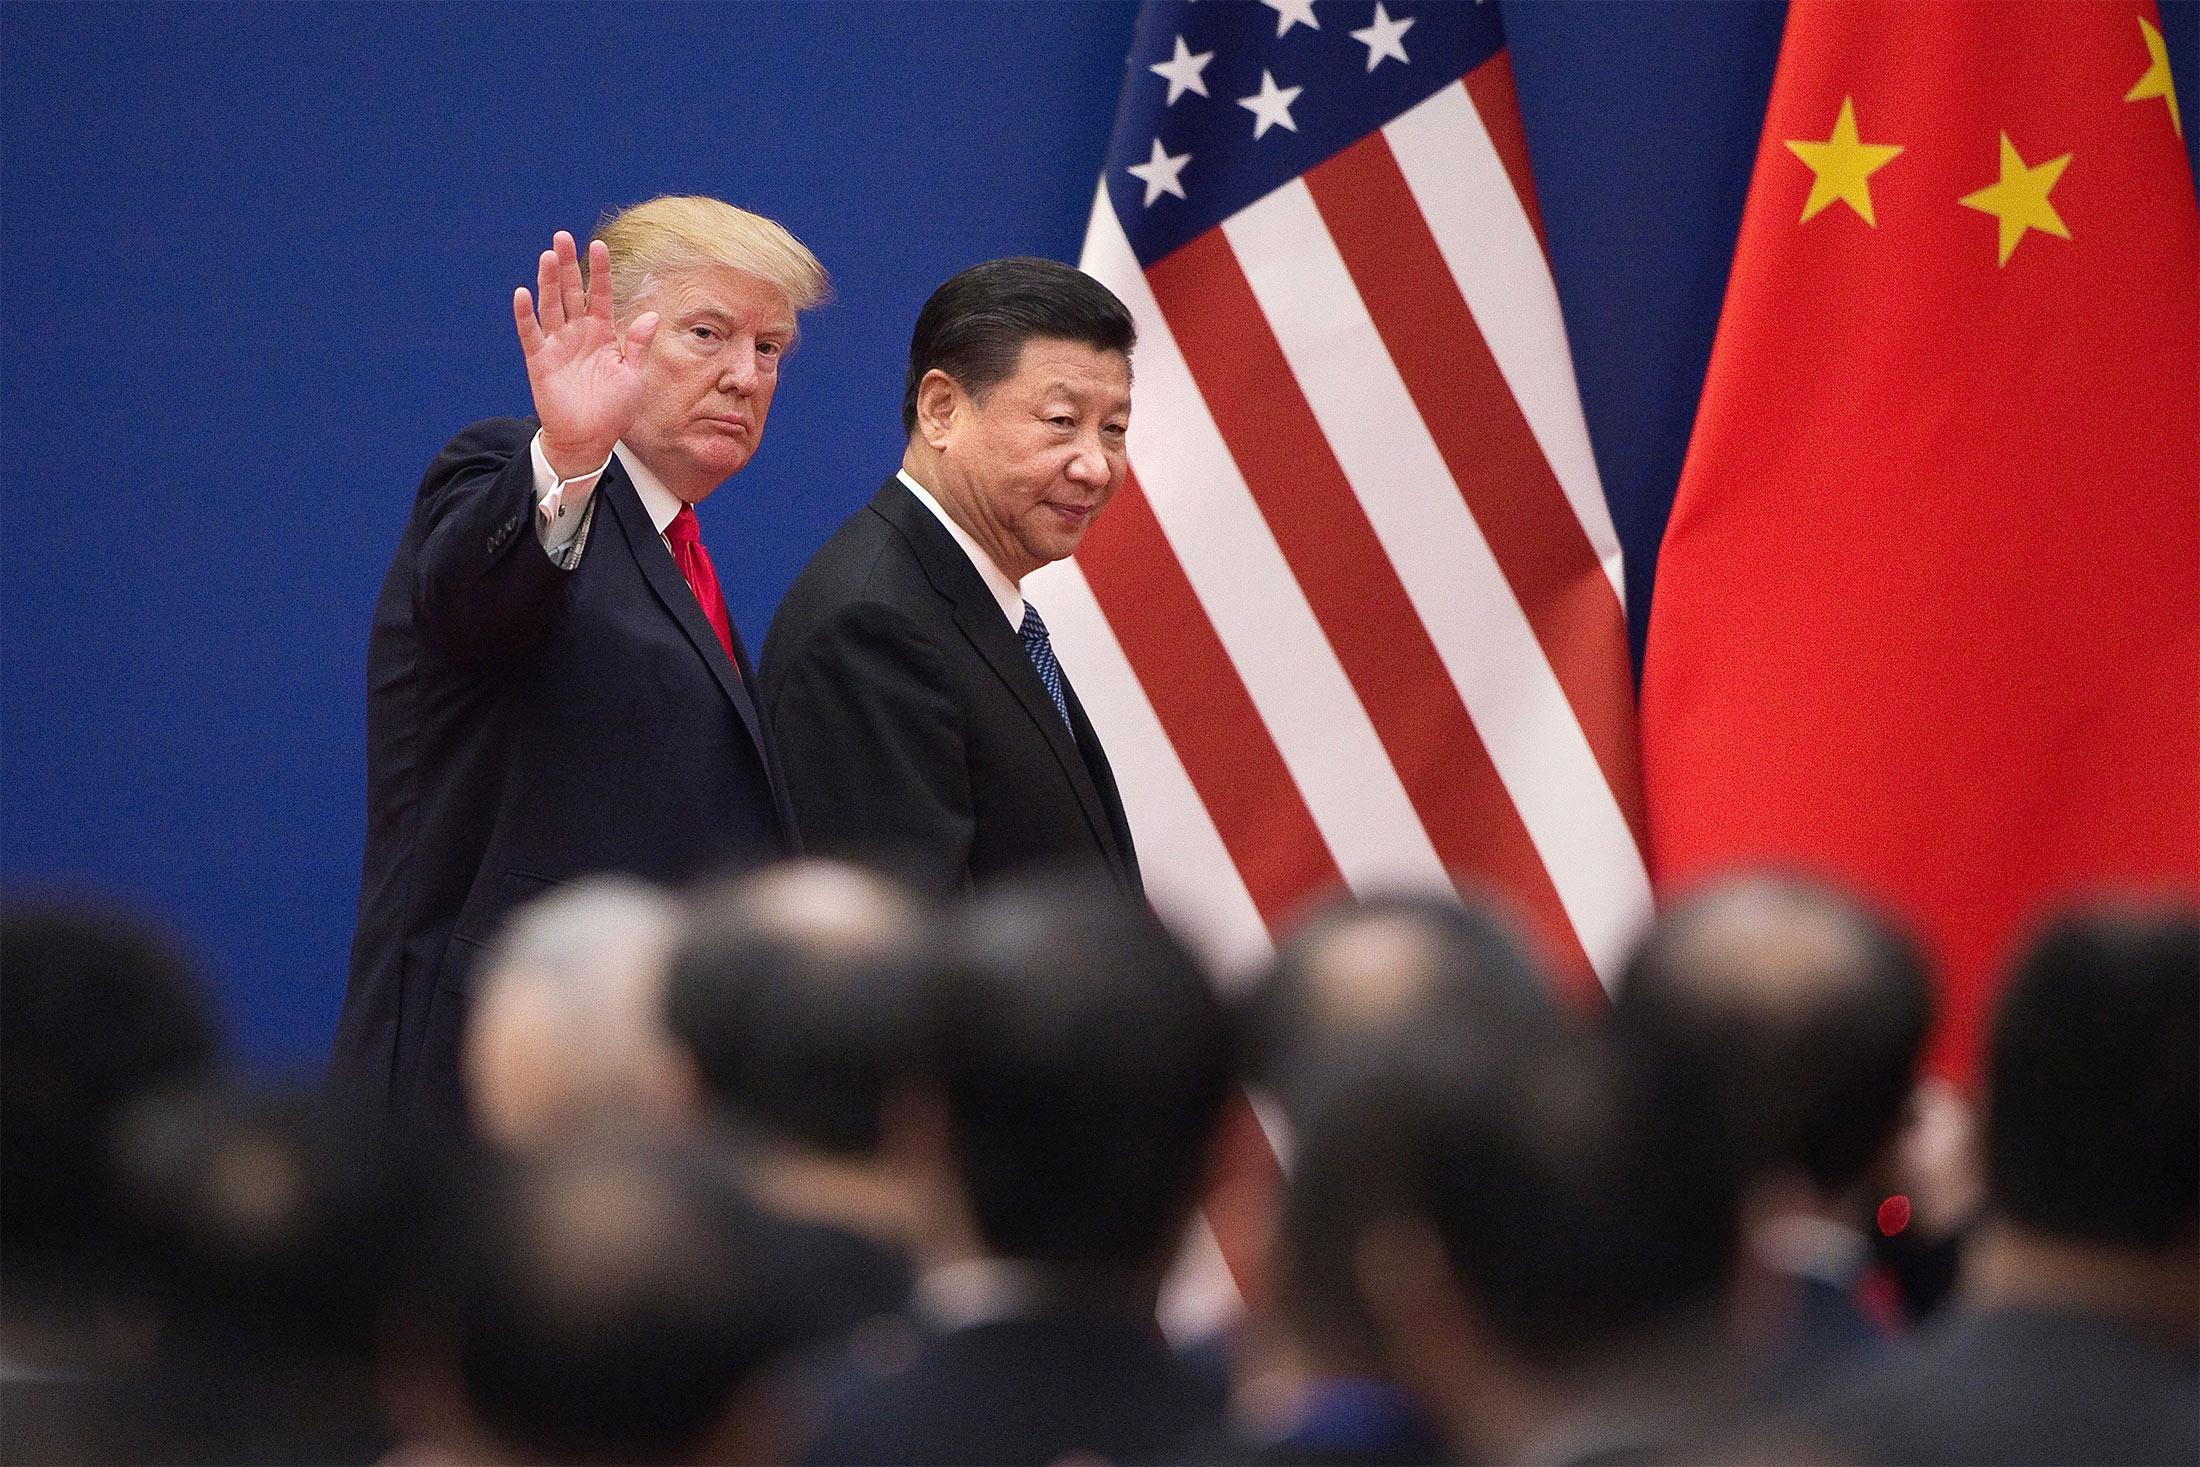 Donald Trump i Xi Jinping w Pekinie w 2017 roku.